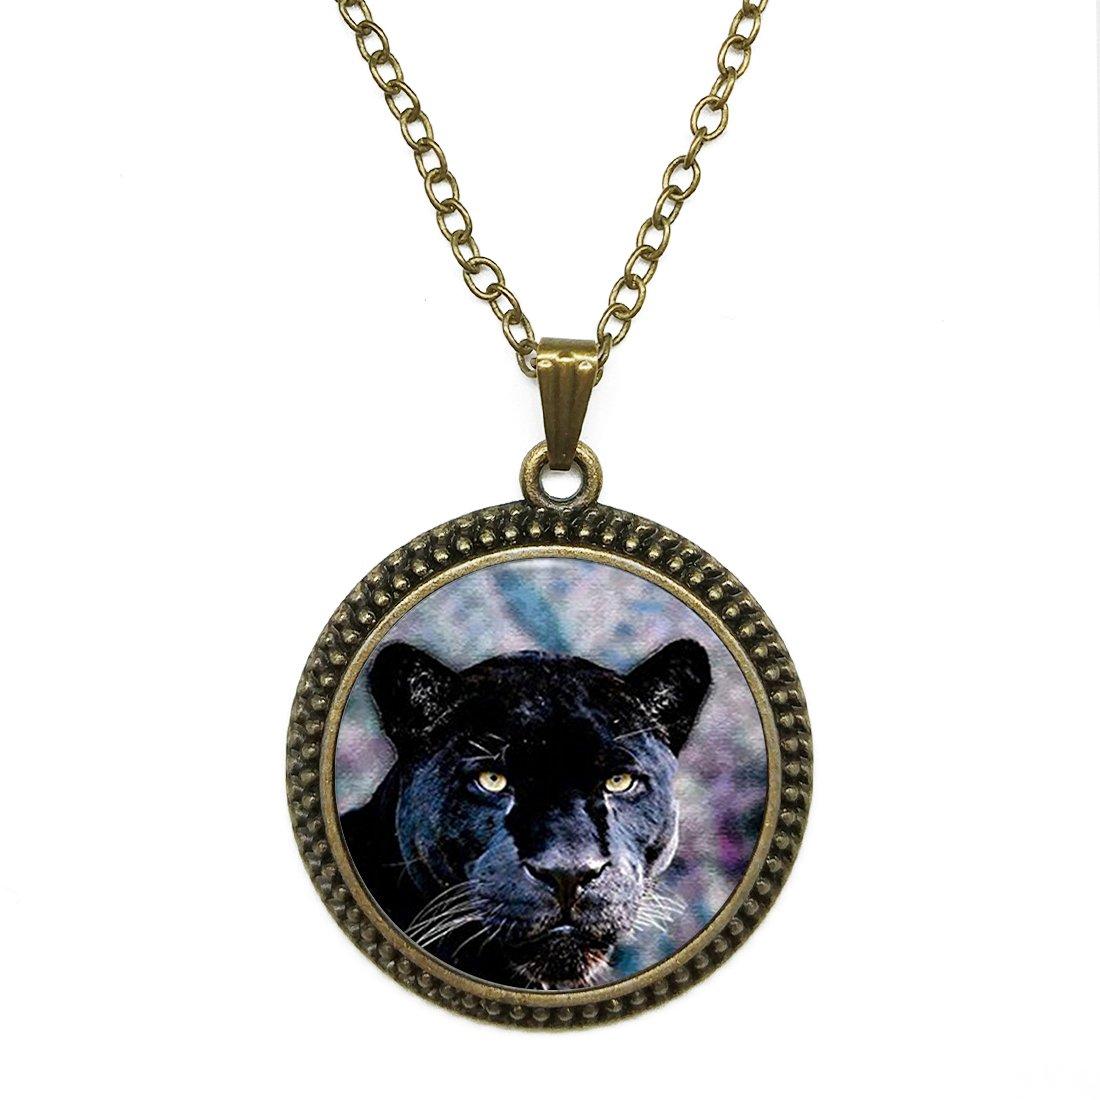 Fashion Necklace Pendant Jewelry Black Panther Vintage Glass Dome Cabochon Steampunk Bronze Necklace